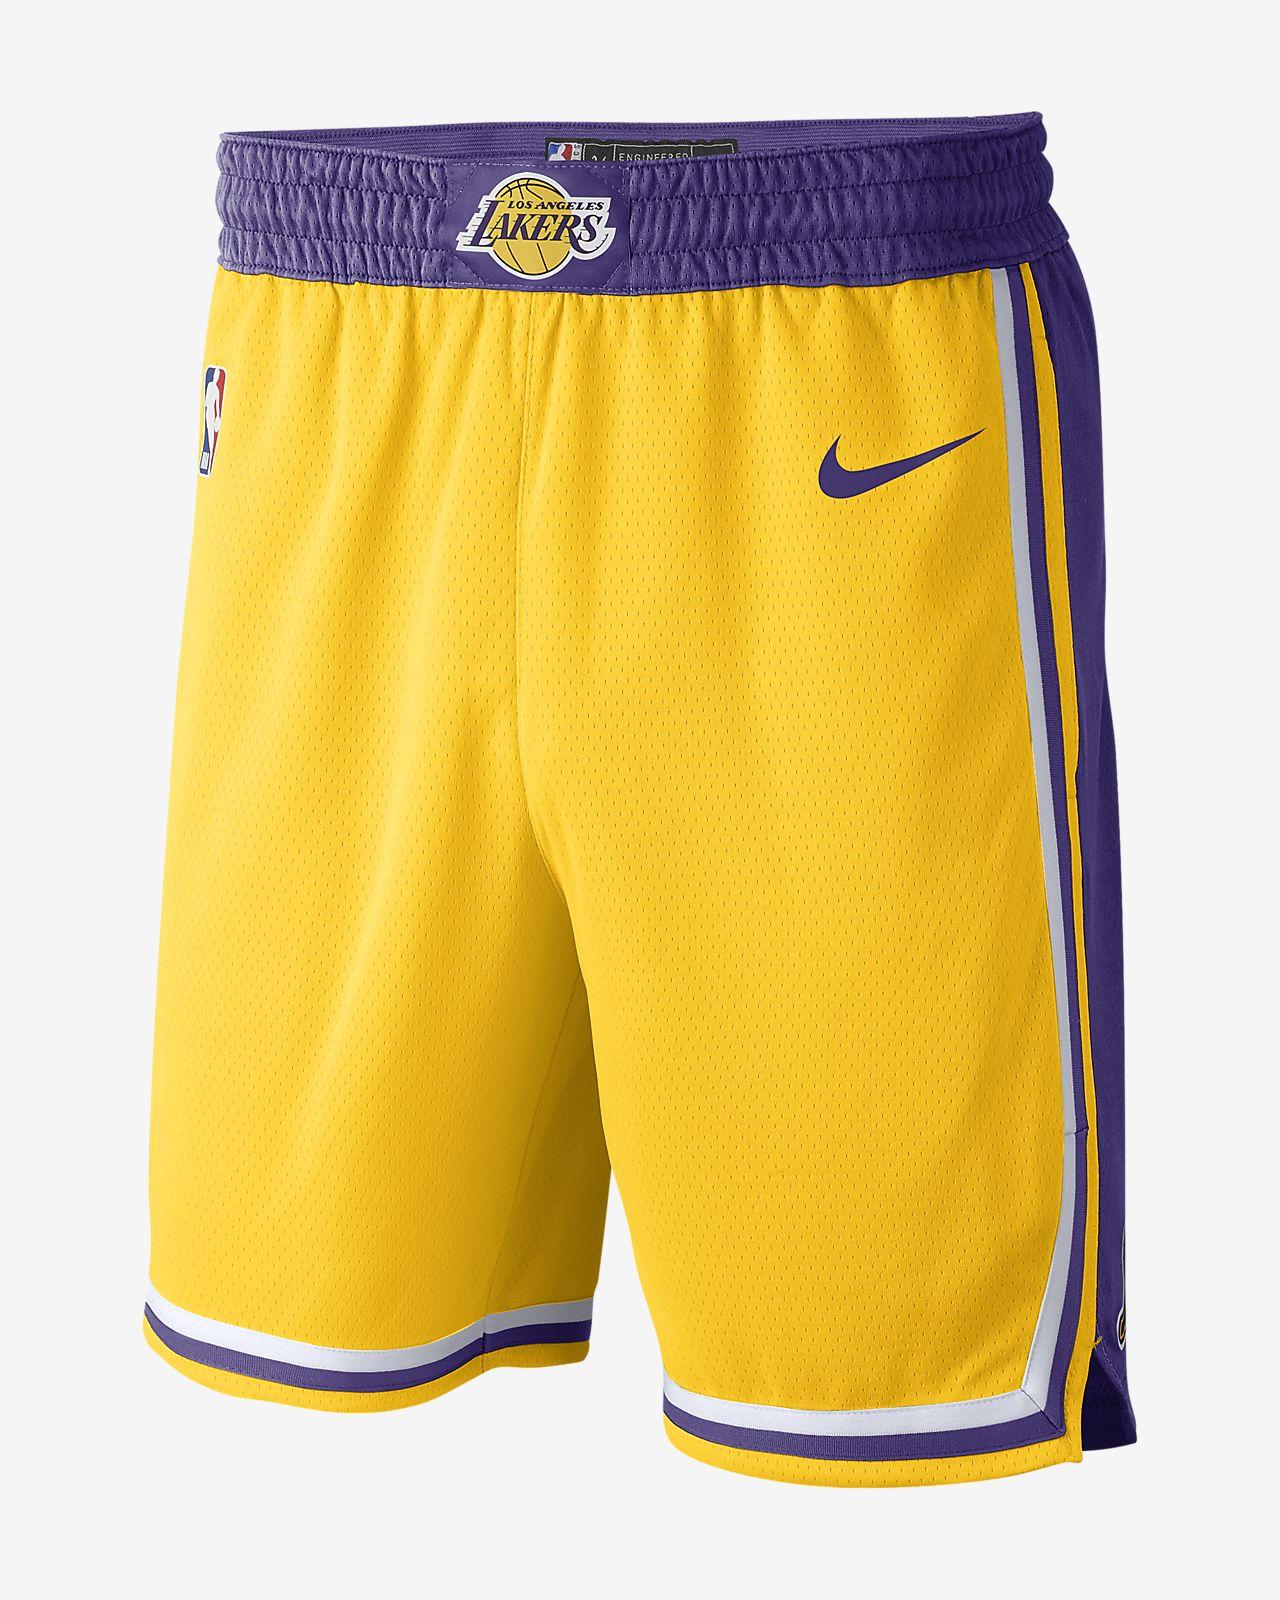 63759dc698b8 Los Angeles Lakers Icon Edition Swingman Nike NBA-Shorts für Herren ...